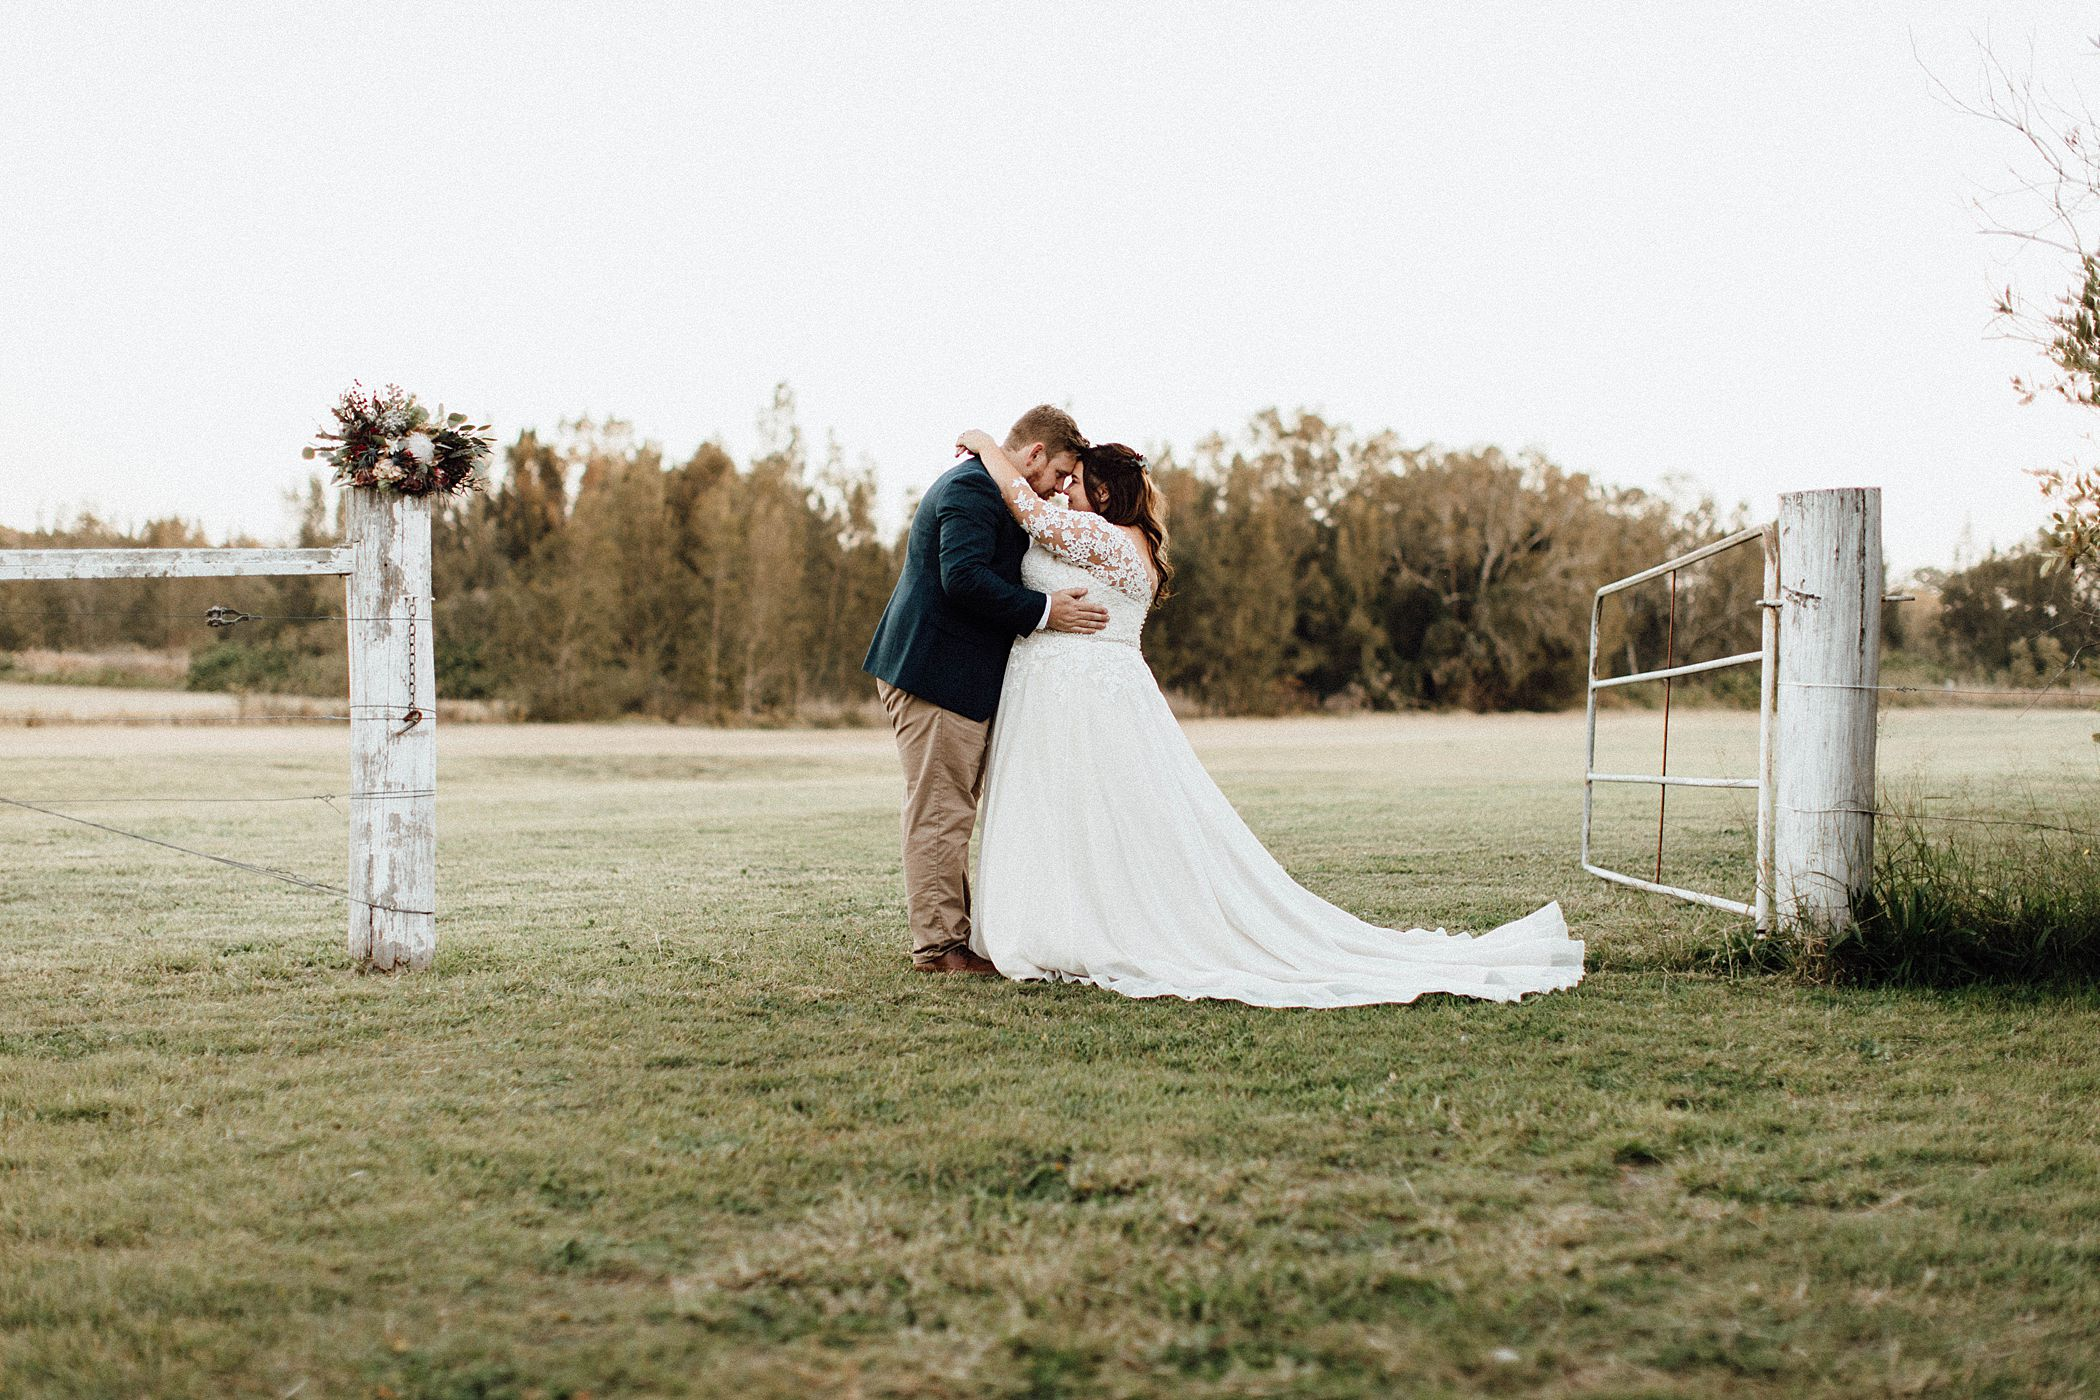 lauren-anne-photography-newcastle-hunter-valley-wedding-photographer_1233.jpg